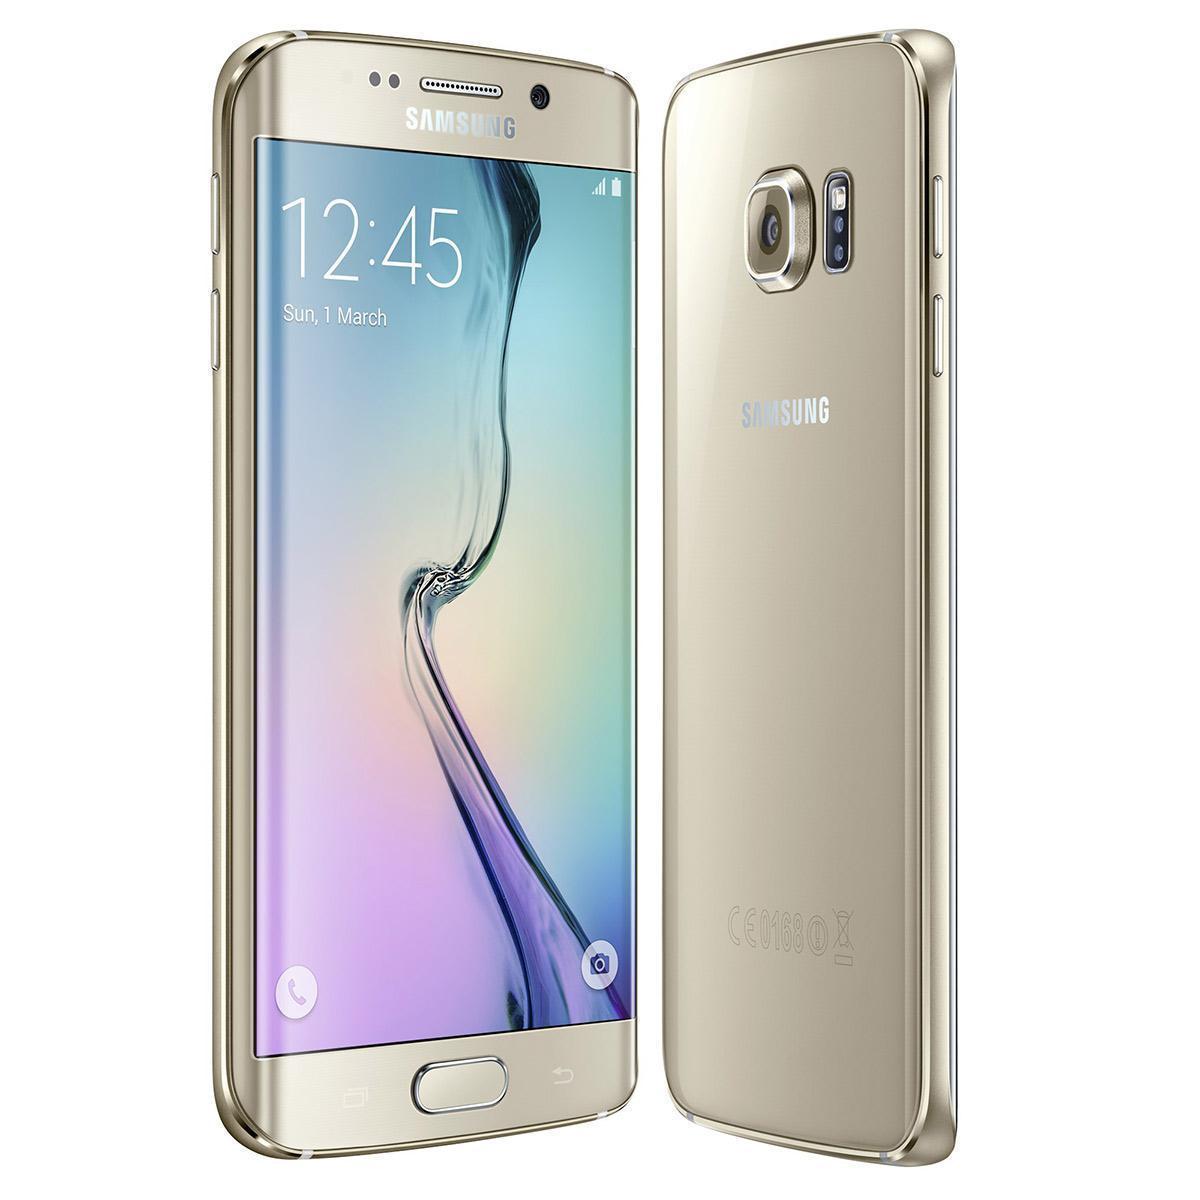 Galaxy S6 128GB - Gold - Ohne Vertrag